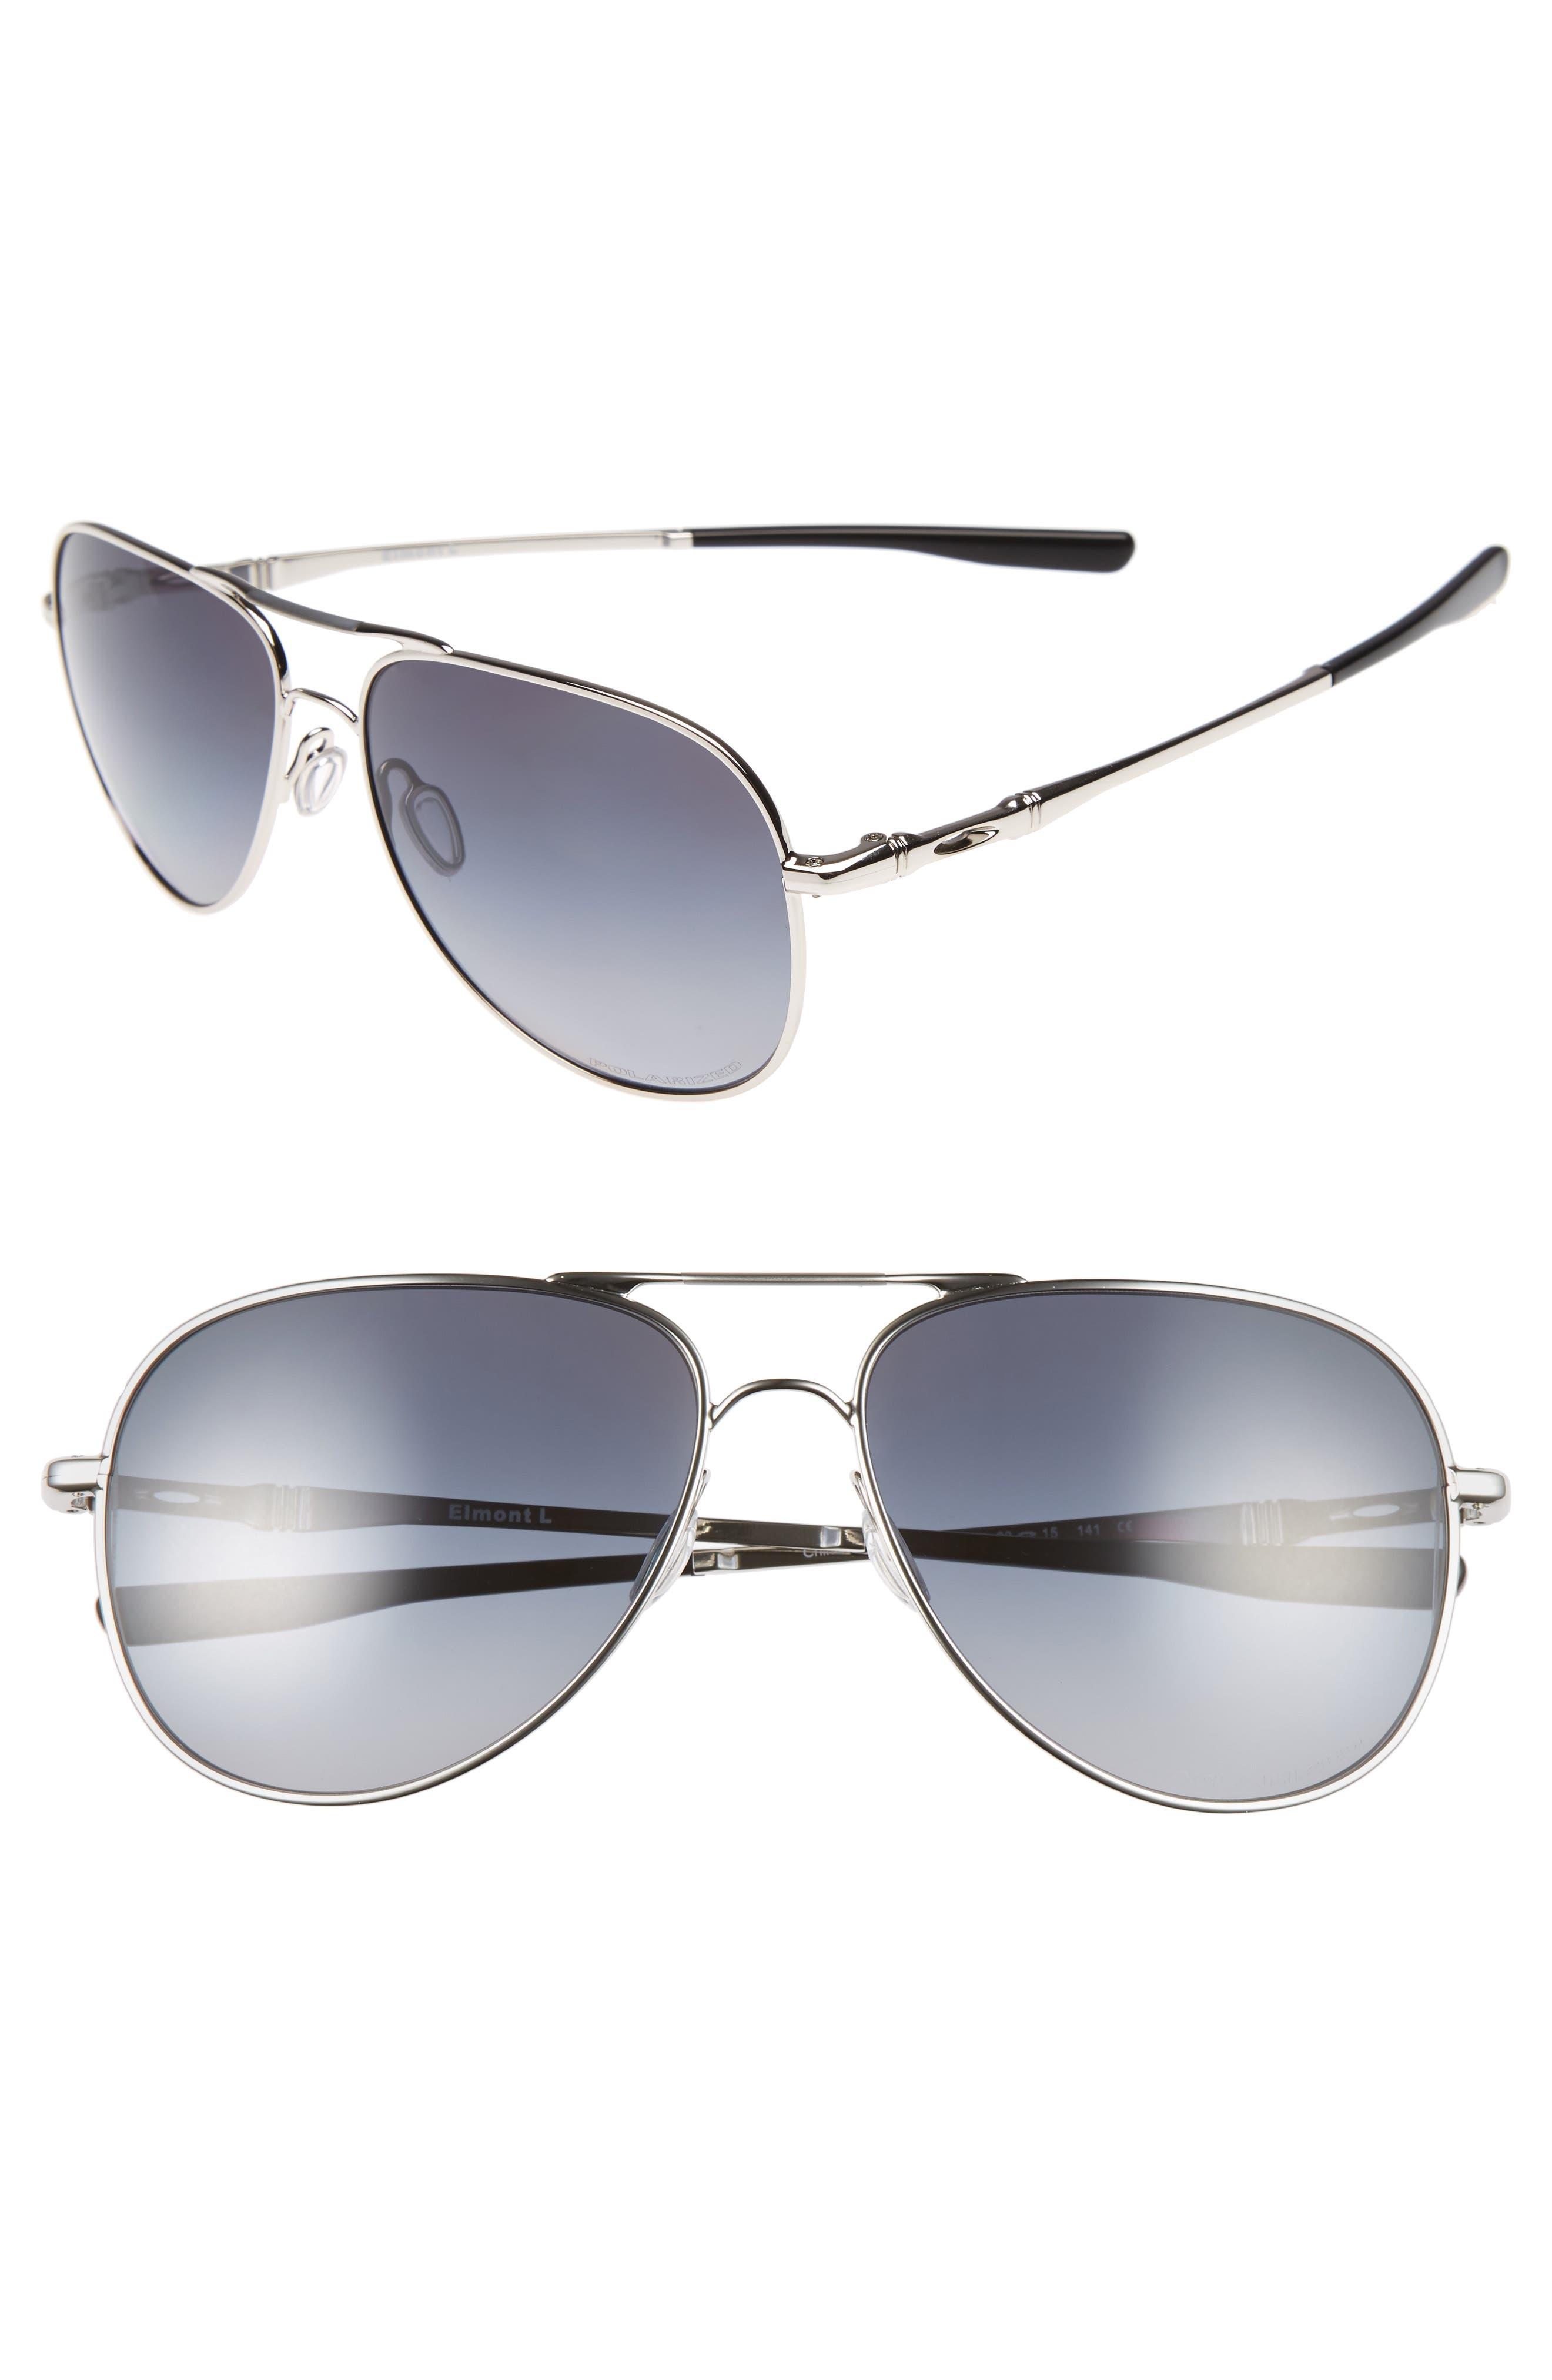 Elmont 61mm Polarized Aviator Sunglasses,                             Main thumbnail 1, color,                             Silver